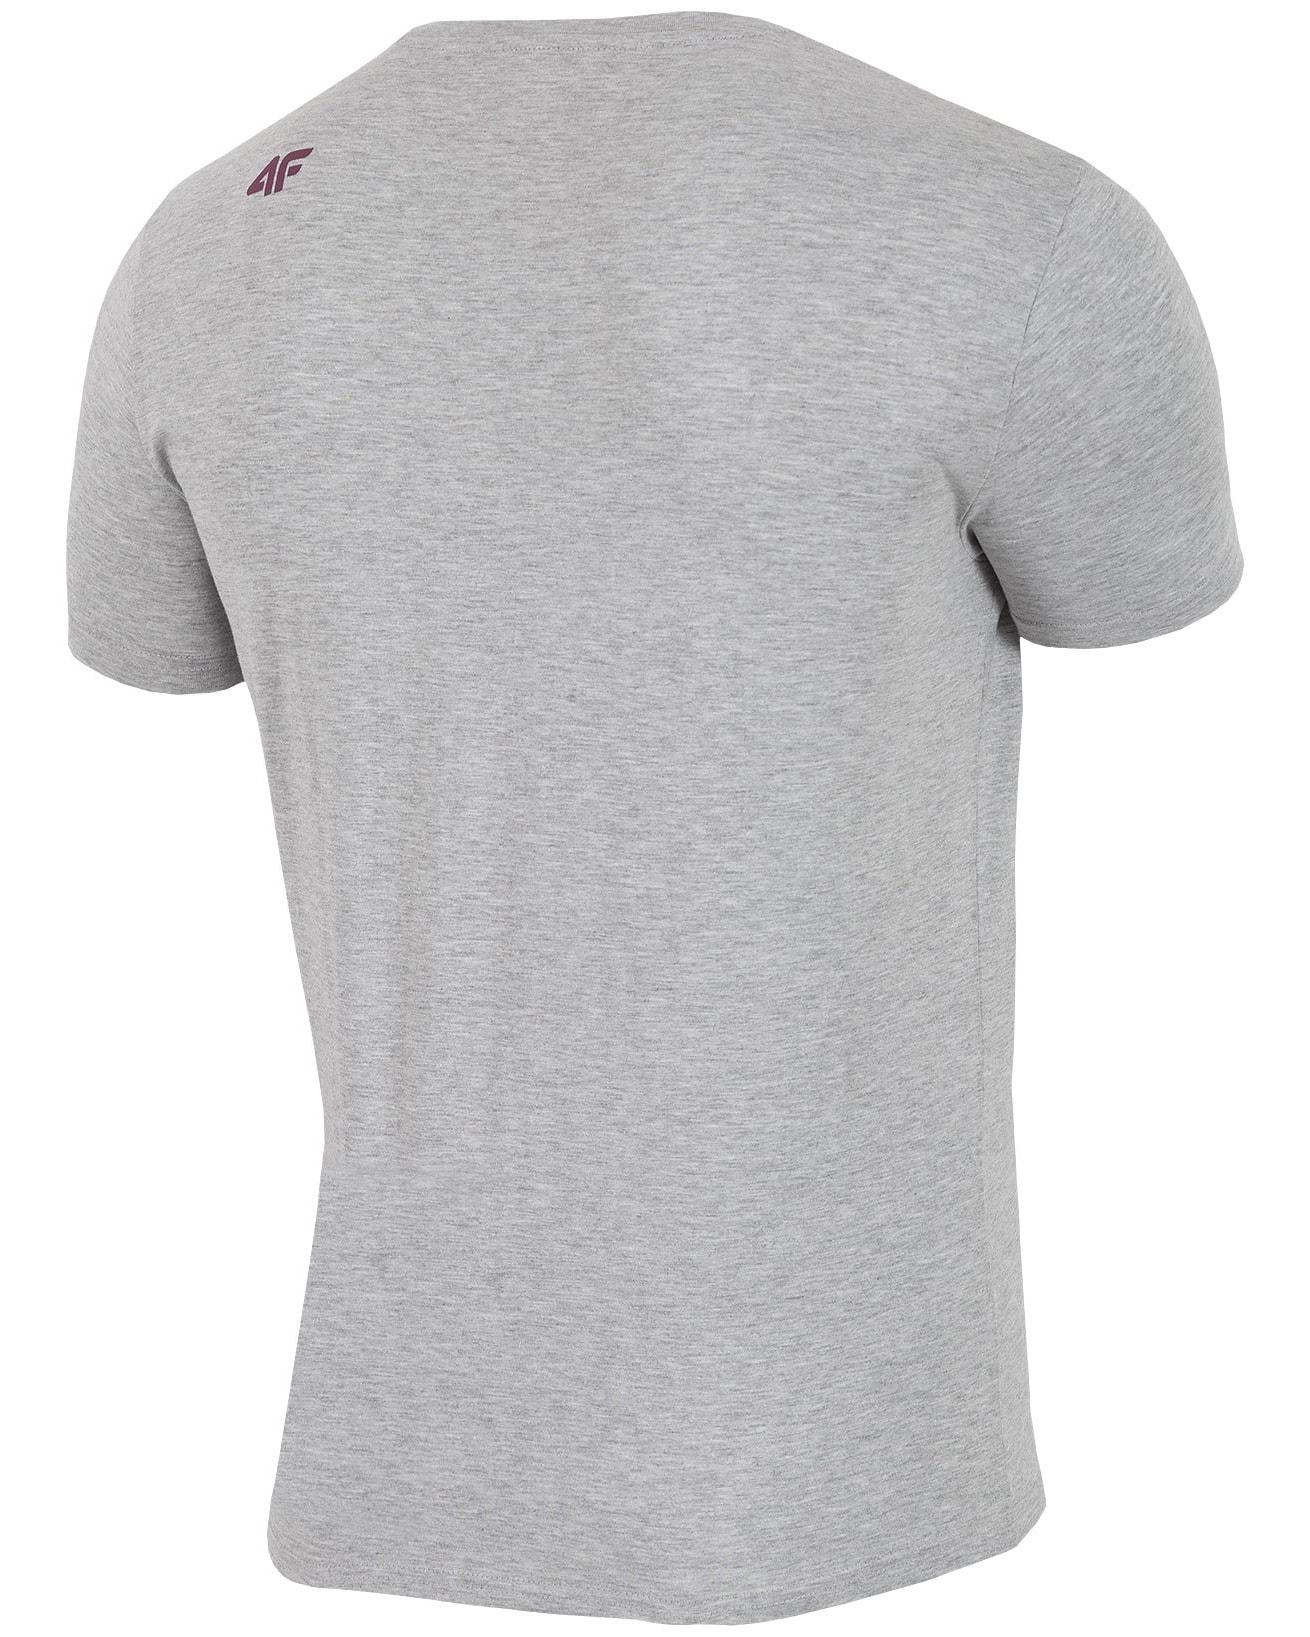 4F Man's T-Shirt - Light Grey Melange